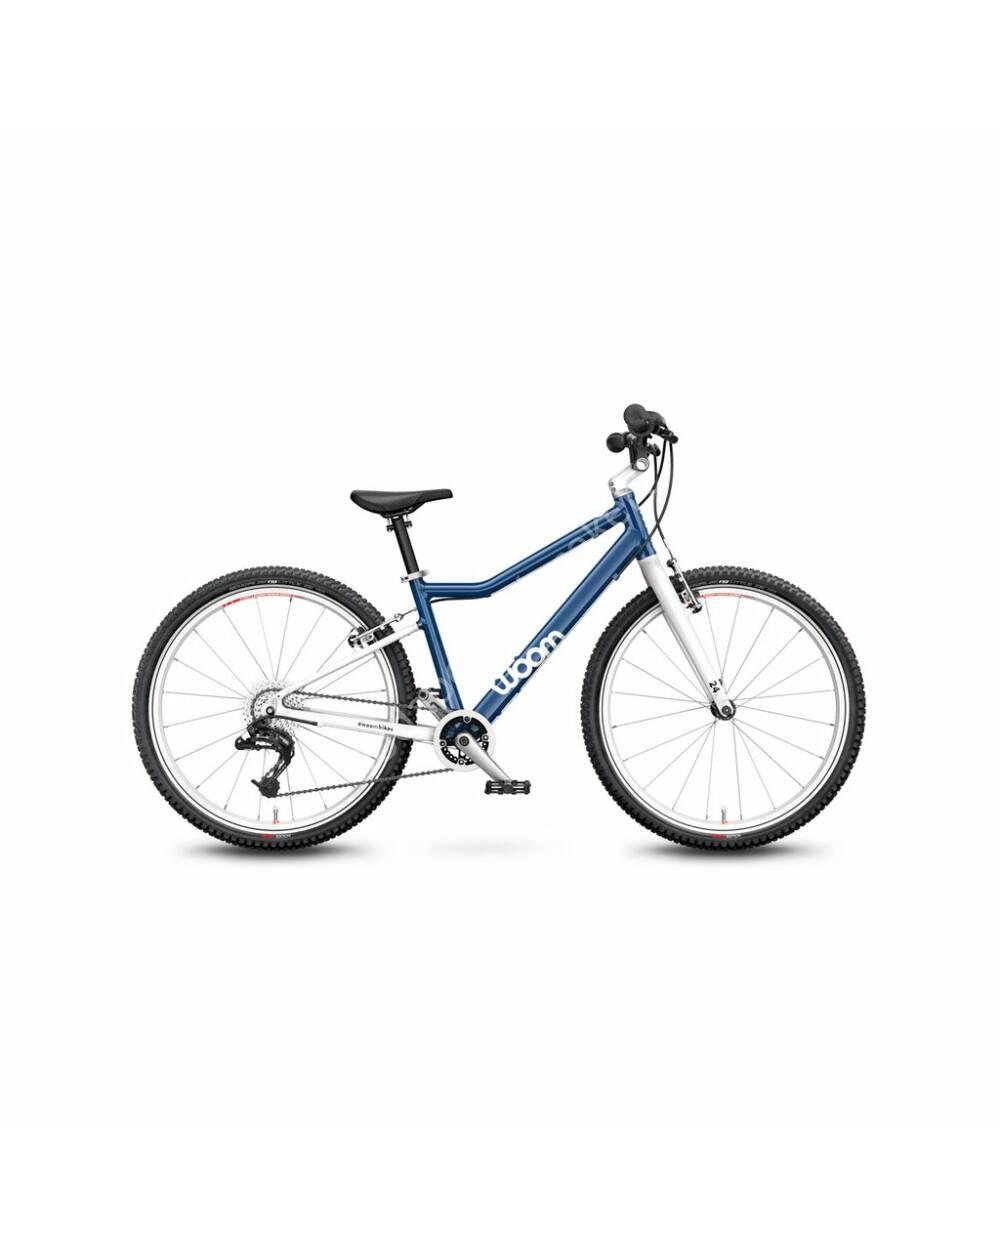 "Woom 5 éjkék 24"" kerékpár, 125-145 cm testmagasság, 8.2kg"